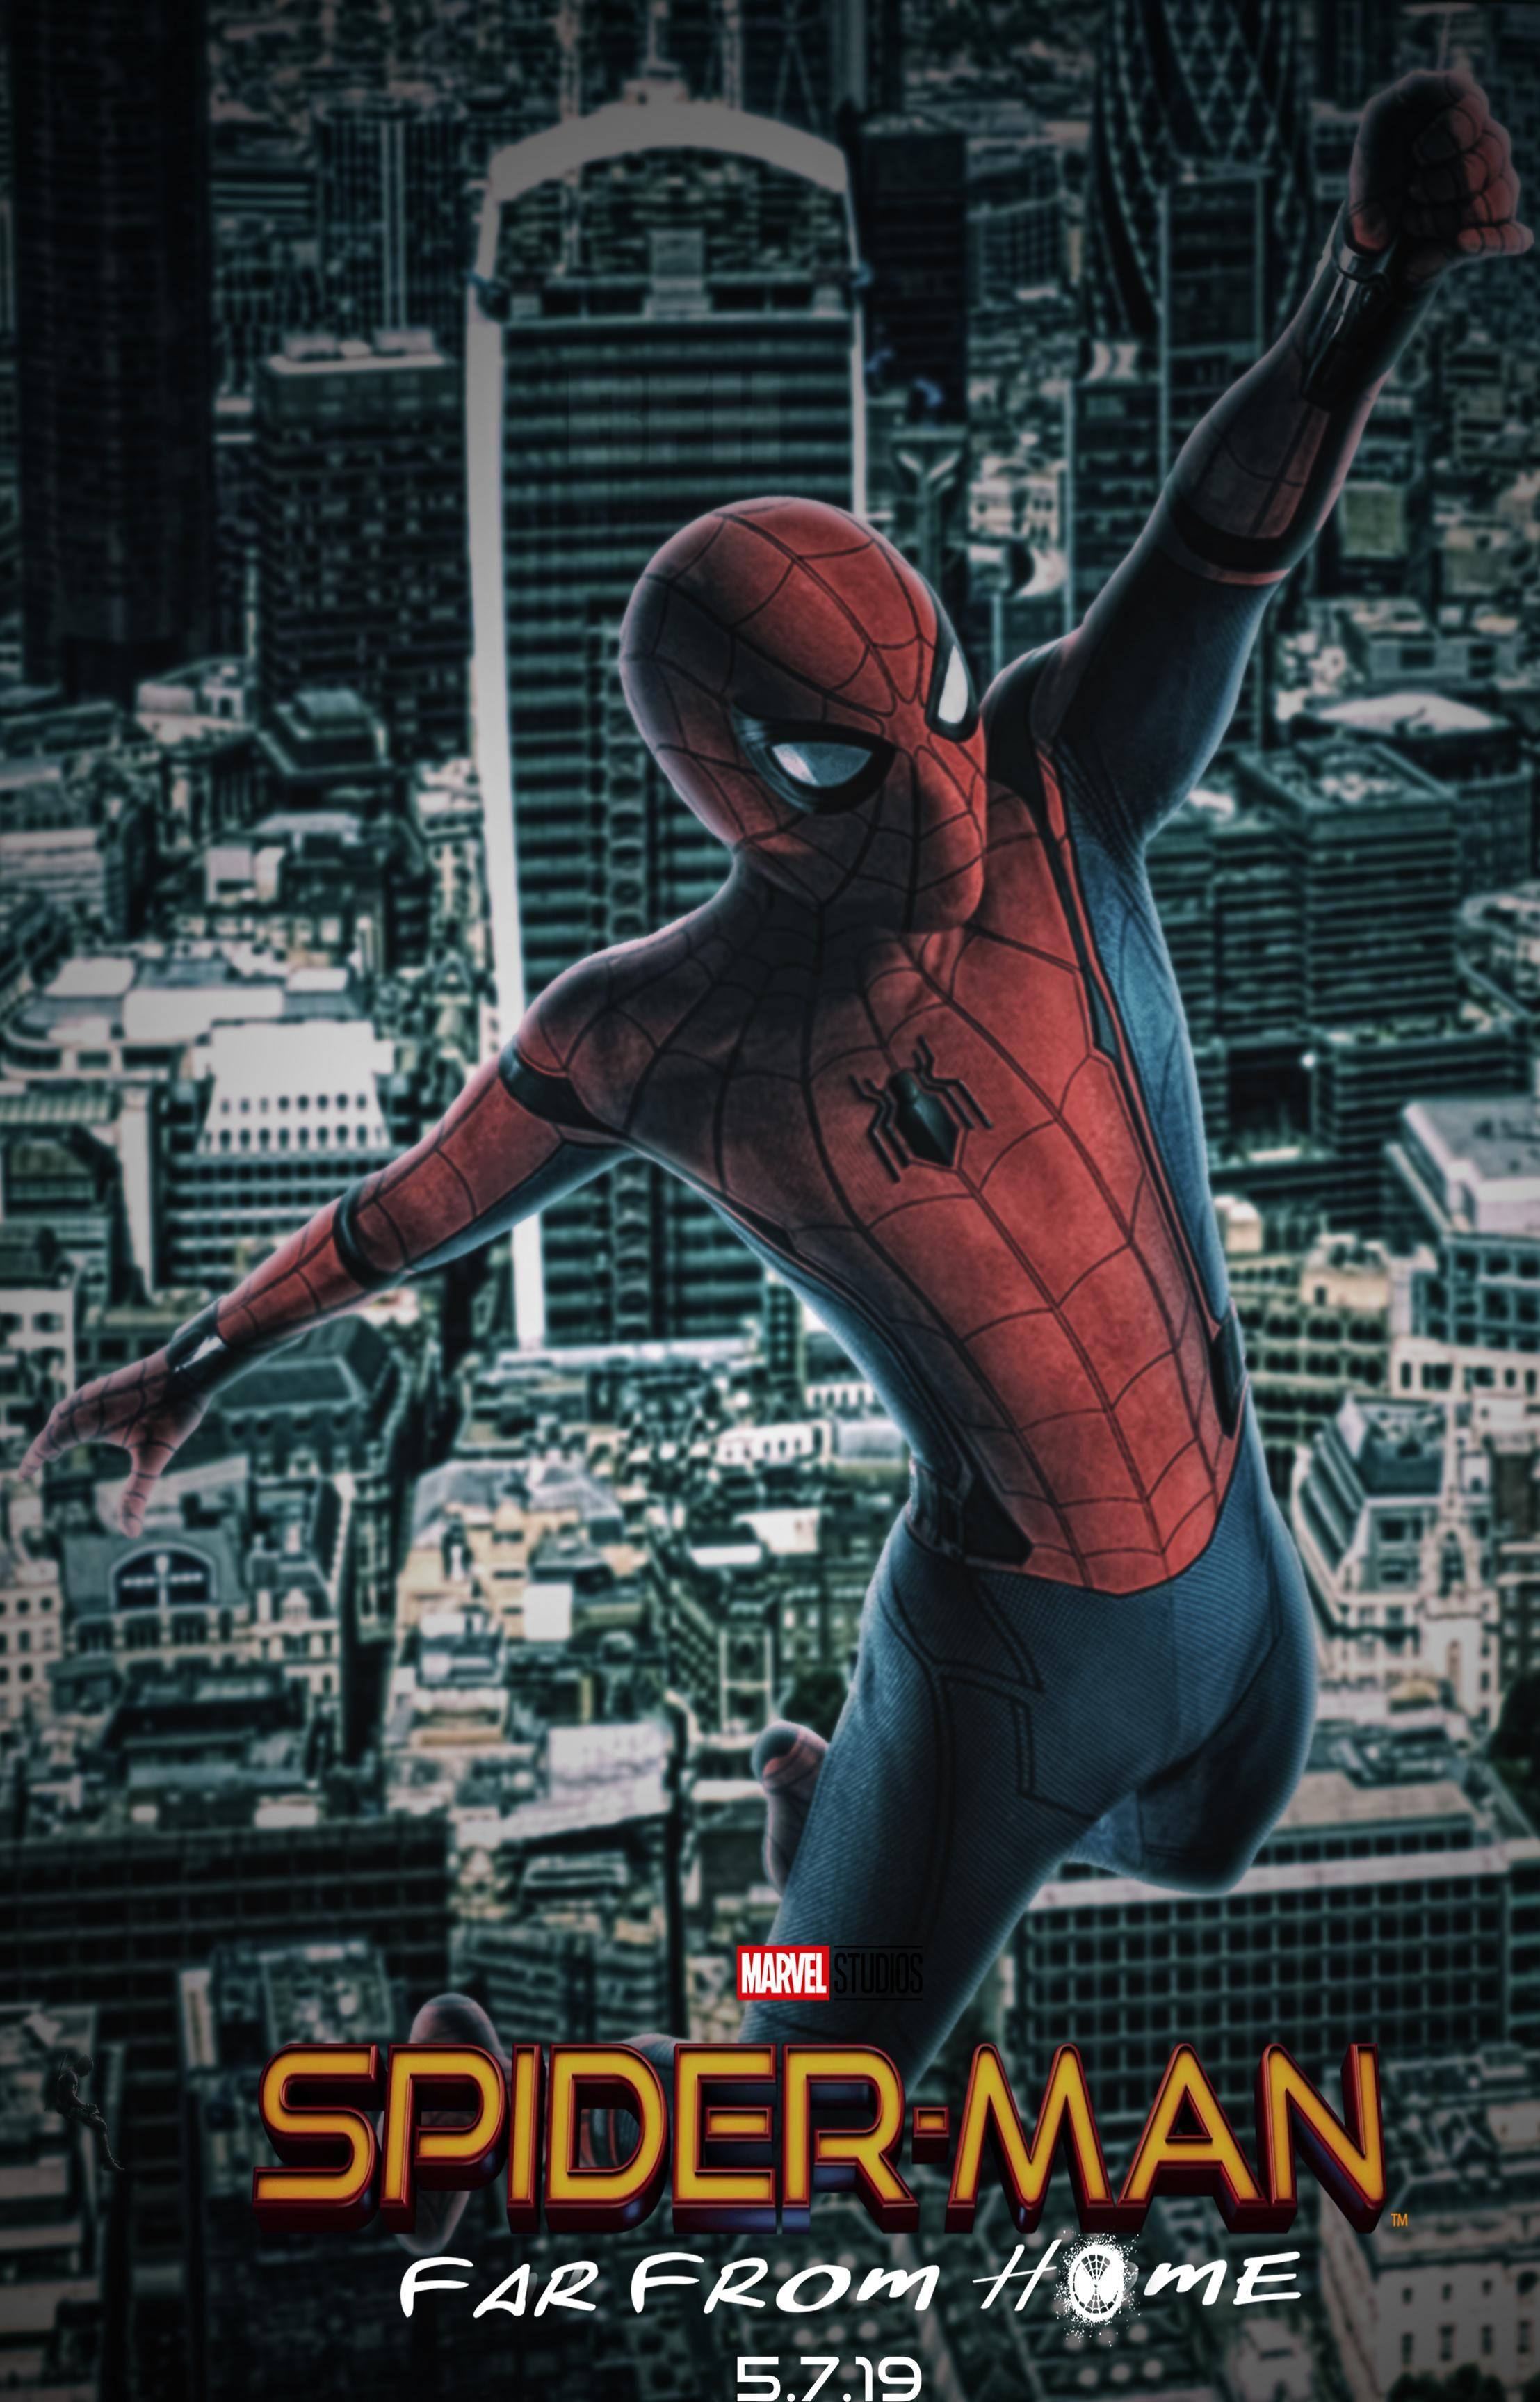 Nonton Film Lk21 Spider-Man : Far From Home (2019) Subtitle Indonesia   LK21 Layarkaca21 – Nonton Film Streaming Movie Bioskop Subtitle Indonesia